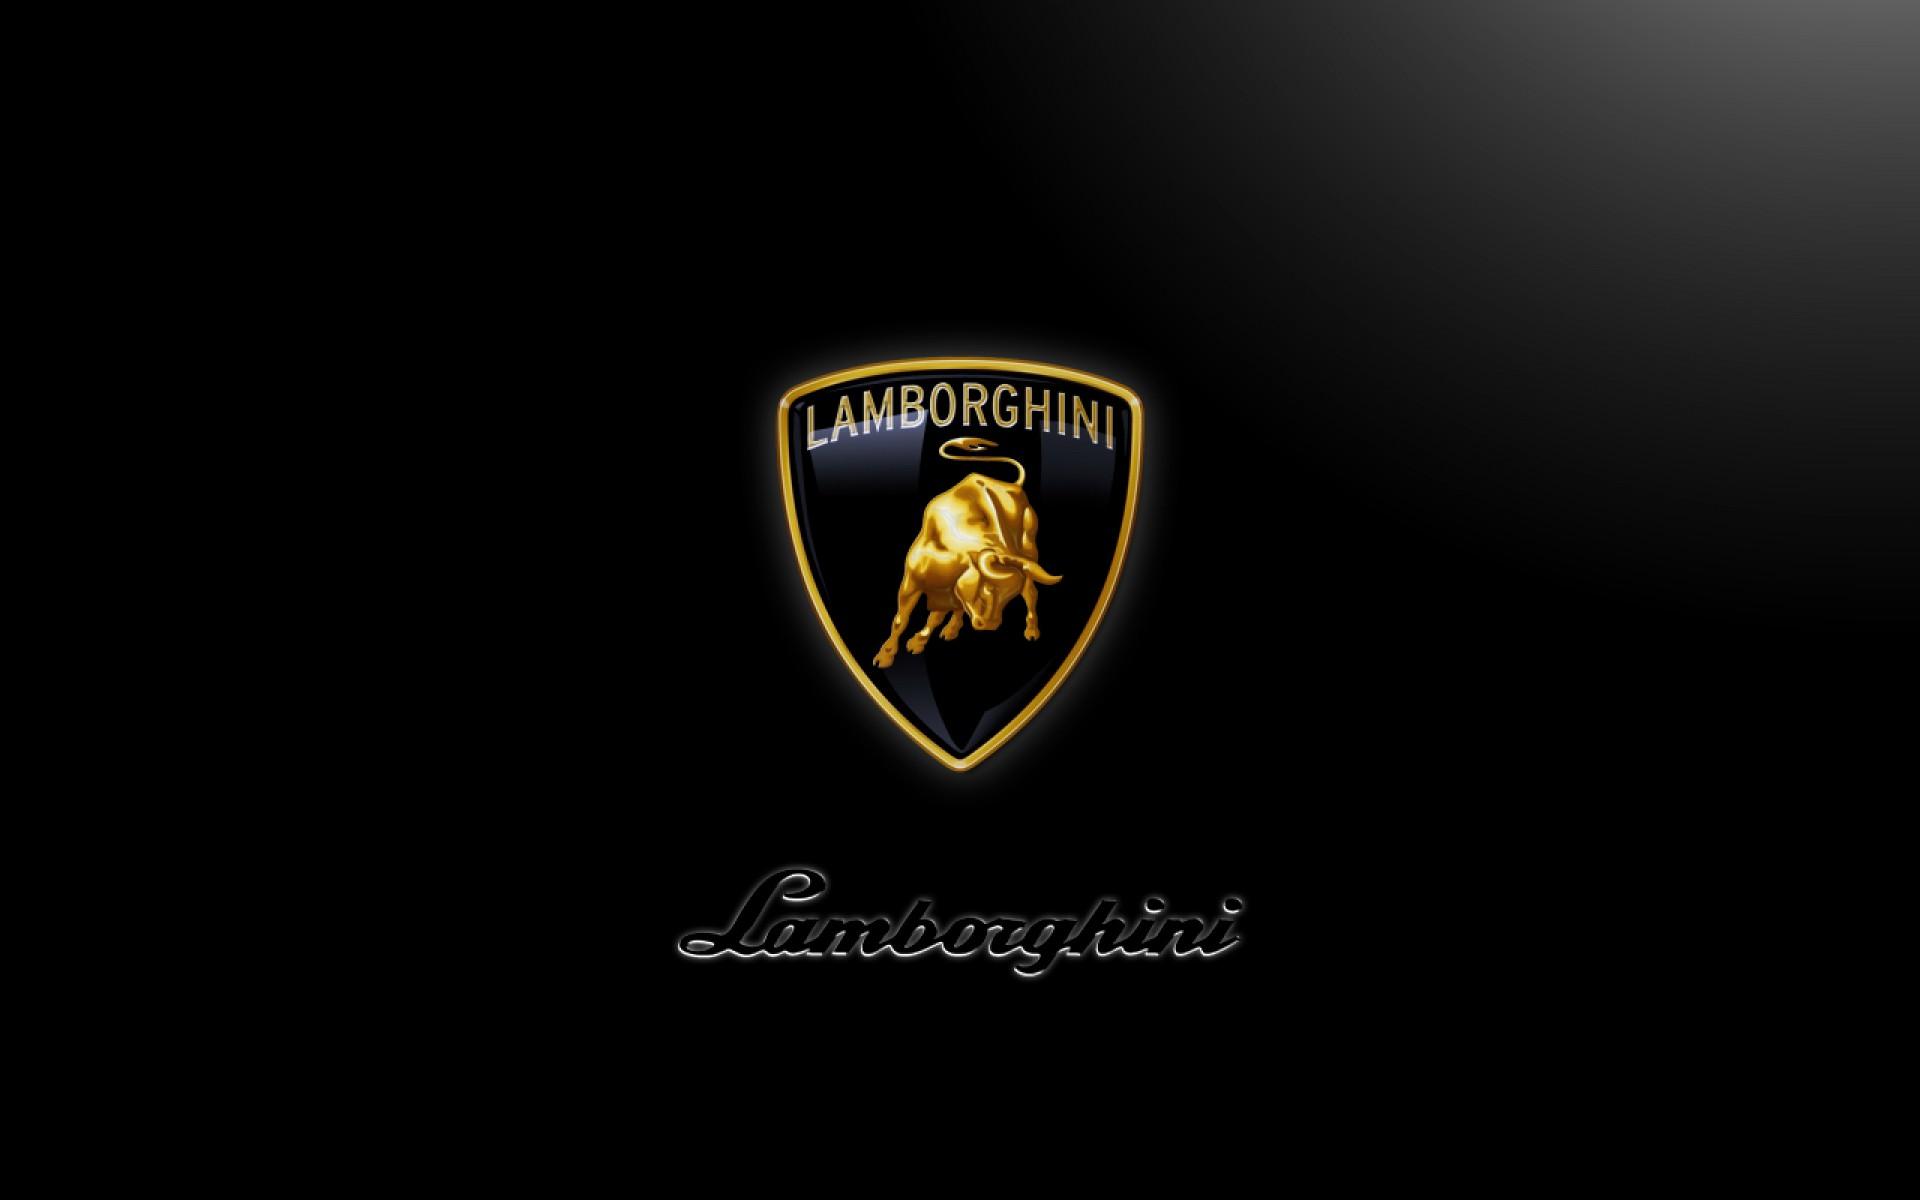 Great Wallpaper Logo Desktop - lamborghini-logo-desktop-wallpaper-58904-60682-hd-wallpapers  Snapshot_87224.jpg